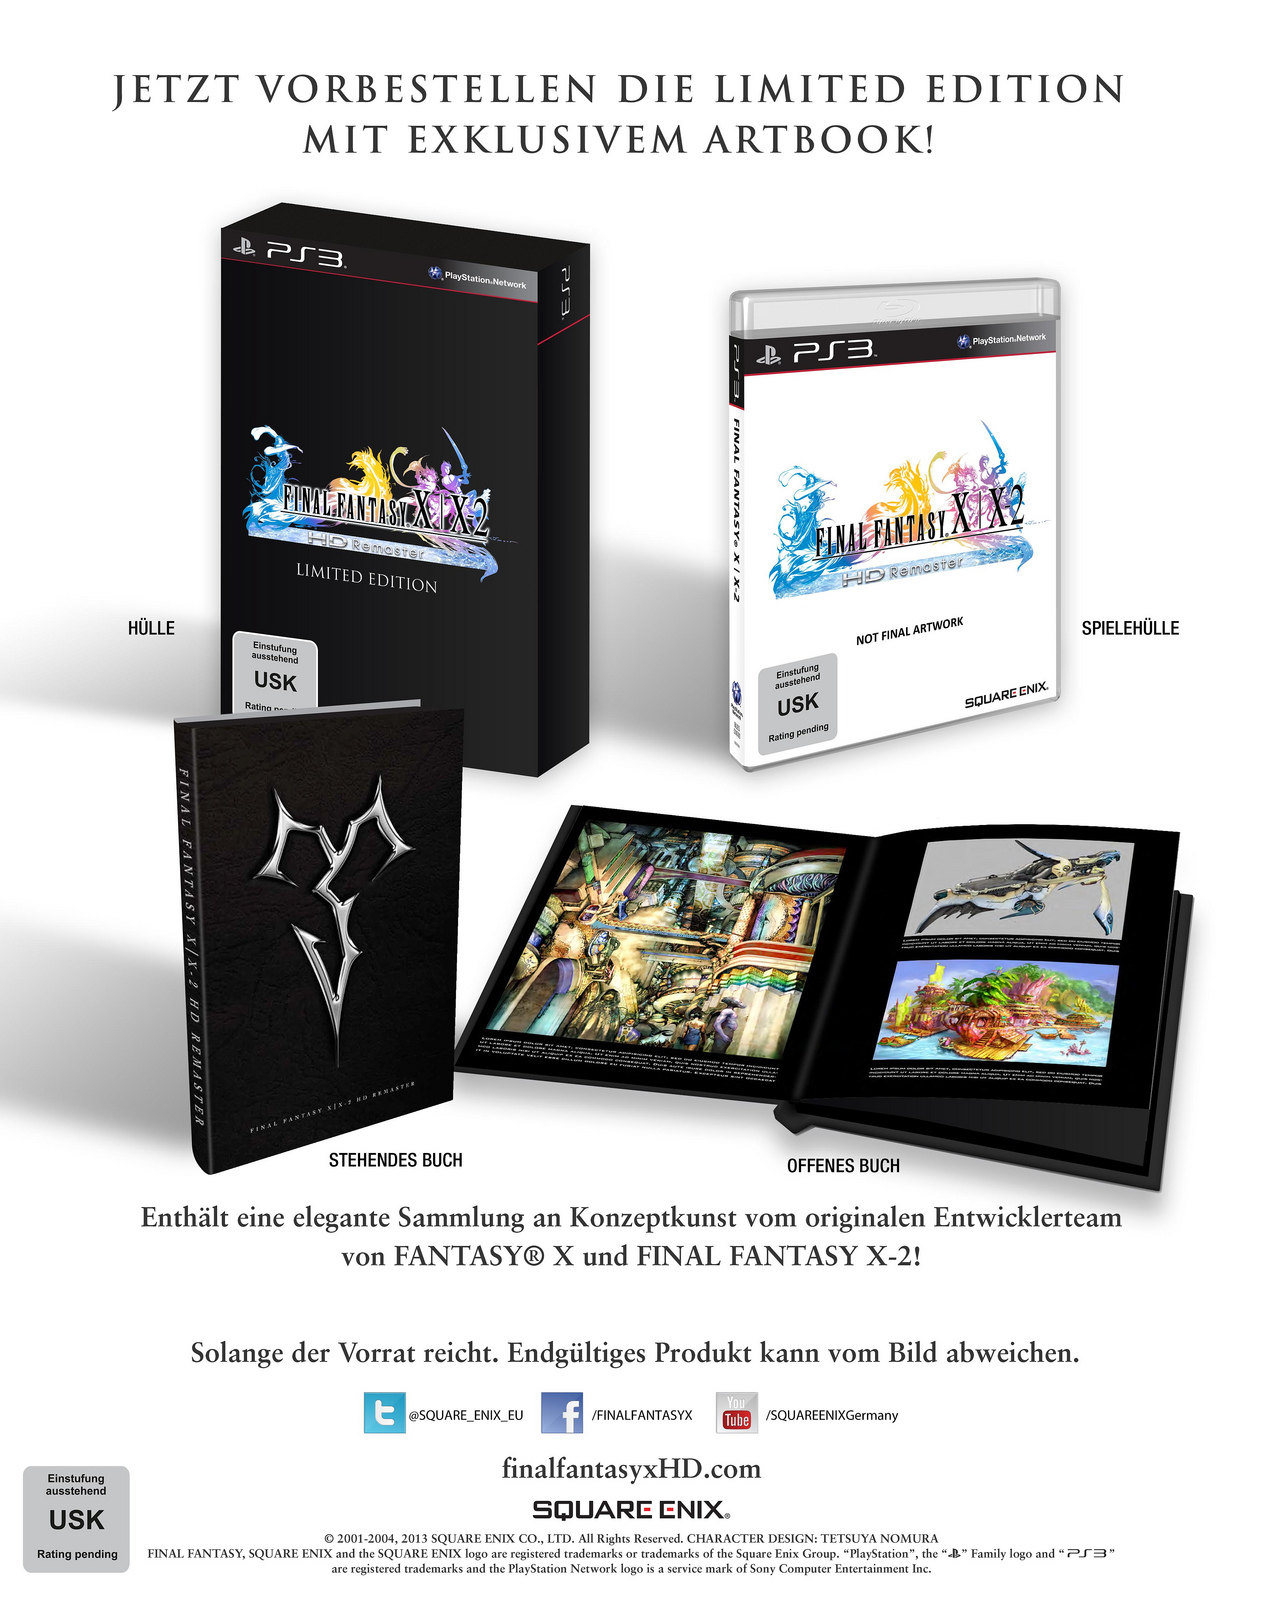 Final Fantasy X/X-2 HD – Limited Edition offiziell angekündigt